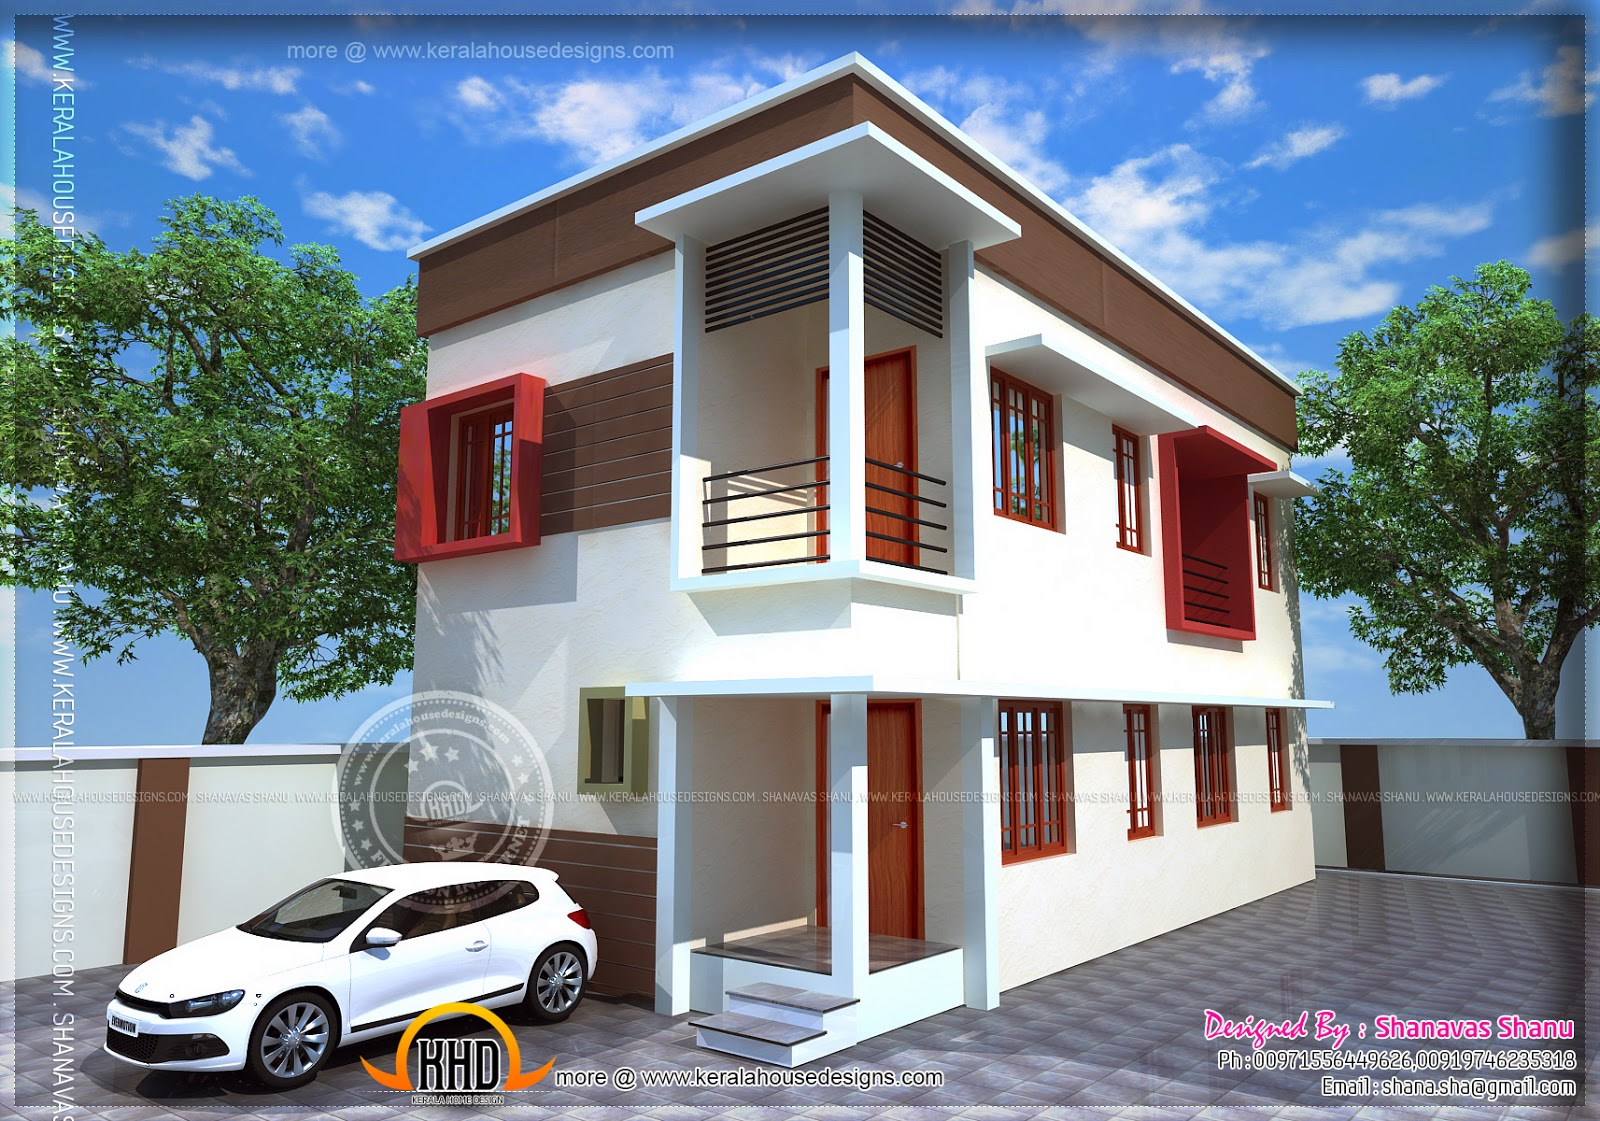 Small plot villa in 2.75 cents of land - Kerala home ...